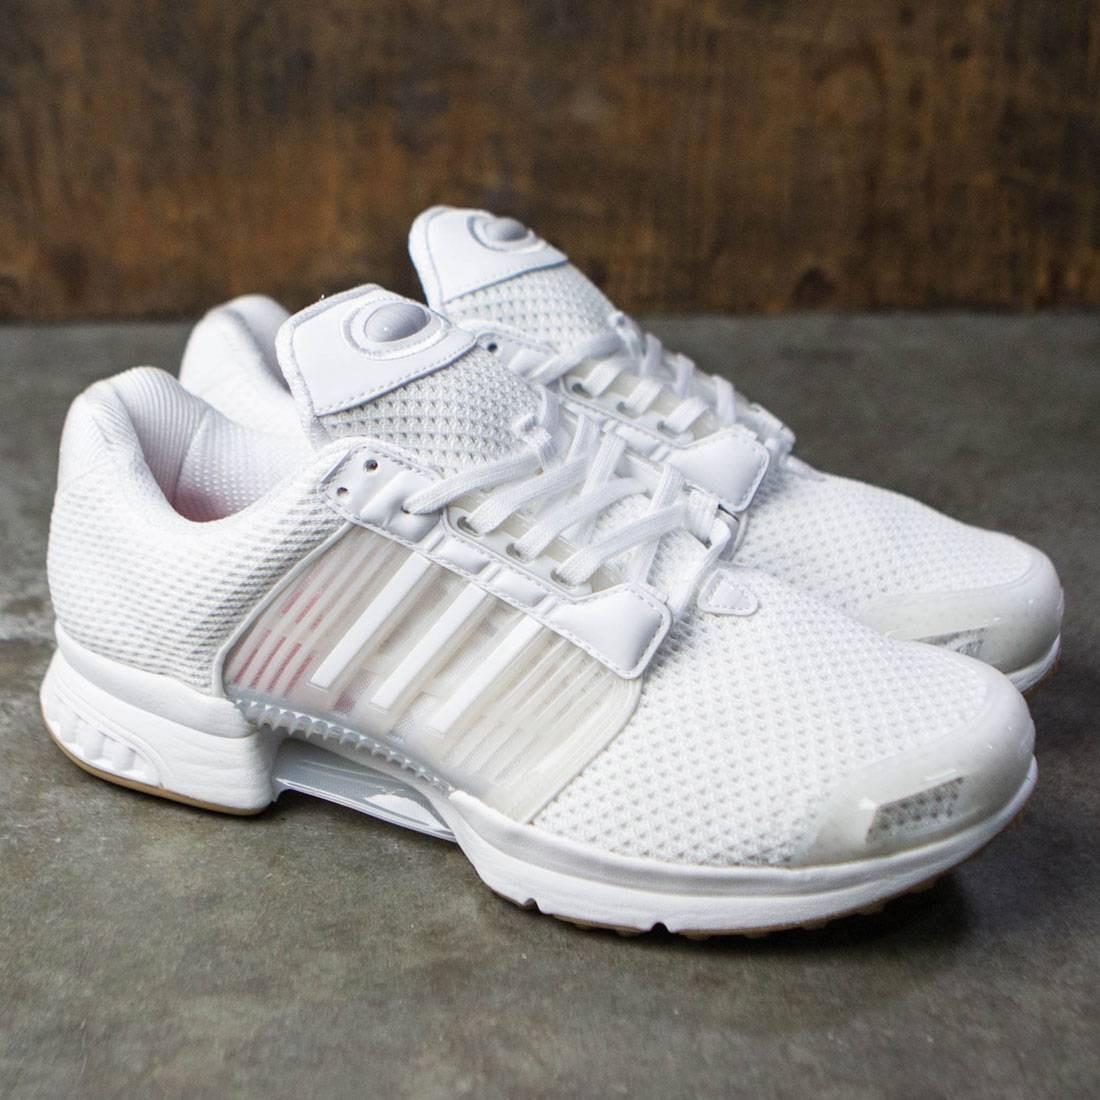 separation shoes dfe57 68066 ... adidas men climacool 1 (white footwear white gum)